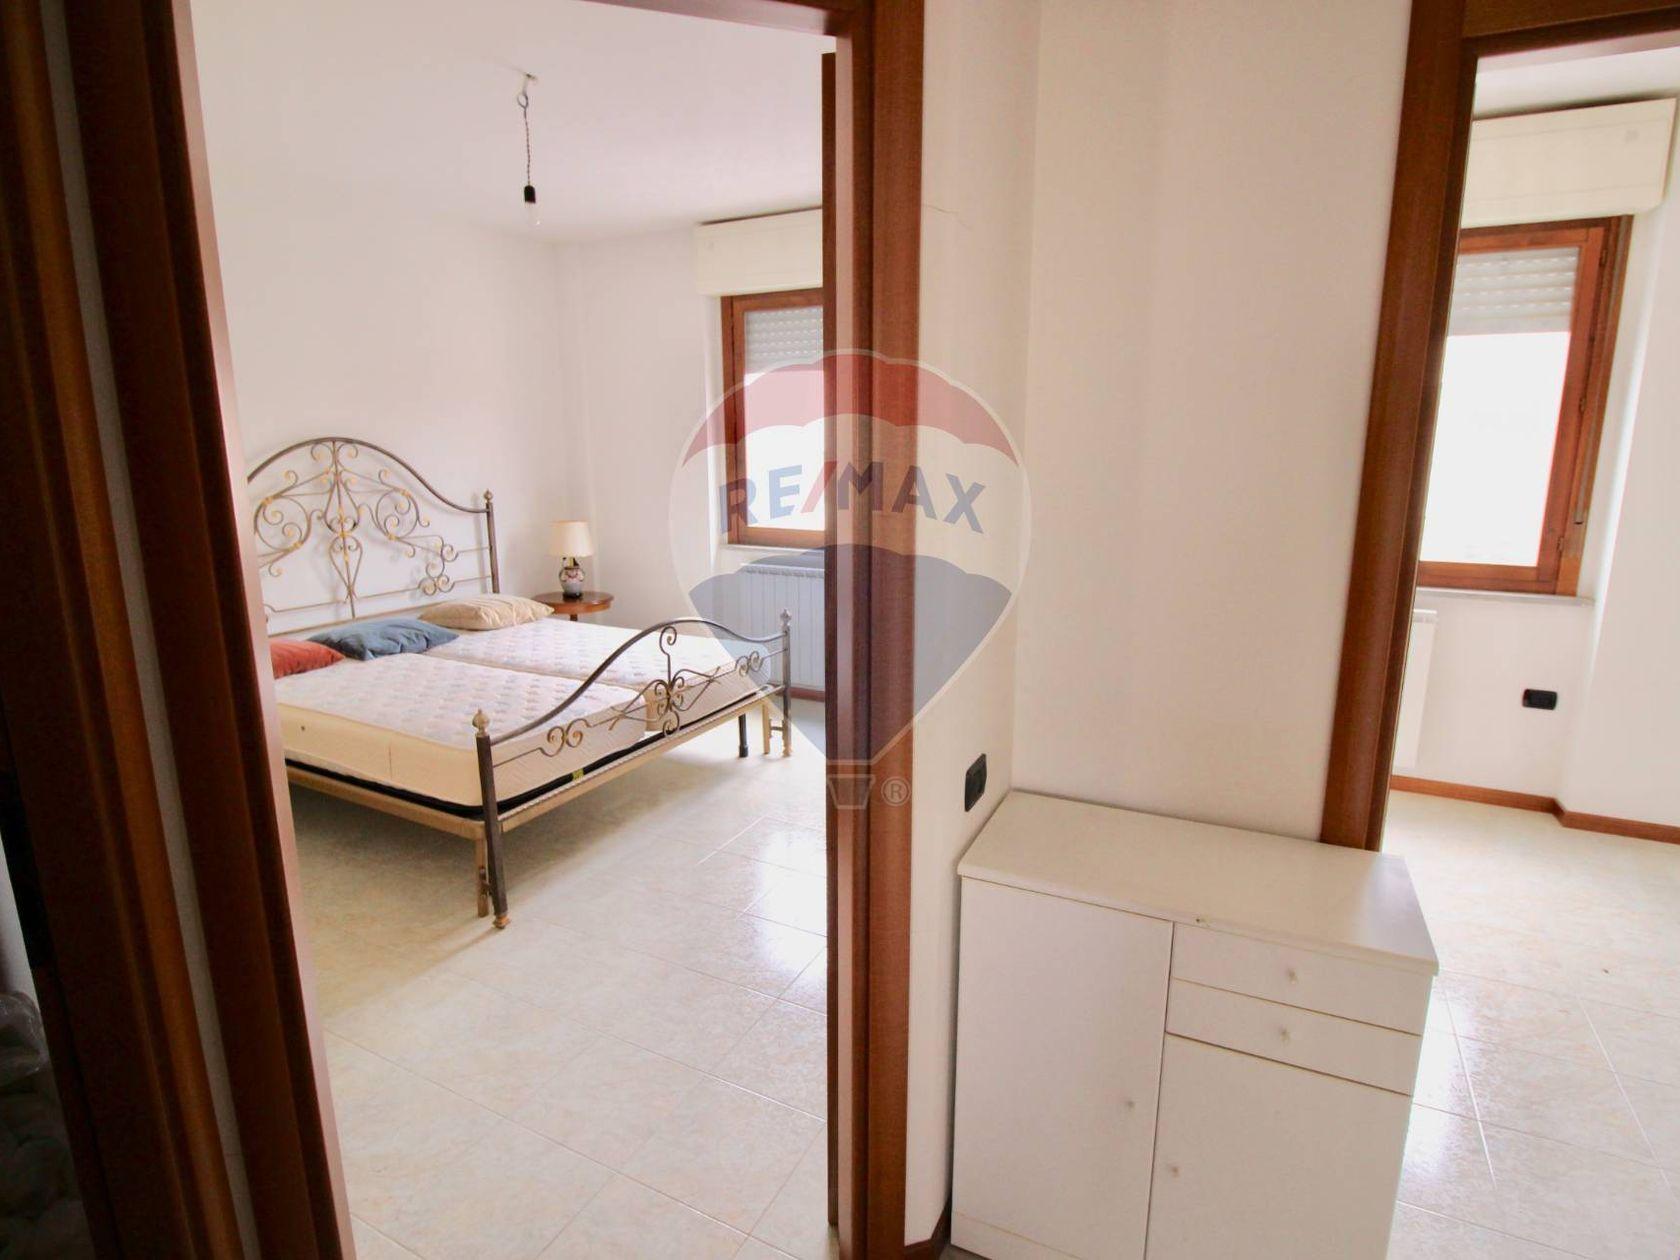 Appartamento Ss-s. Orsola Storica, Sassari, SS Vendita - Foto 15